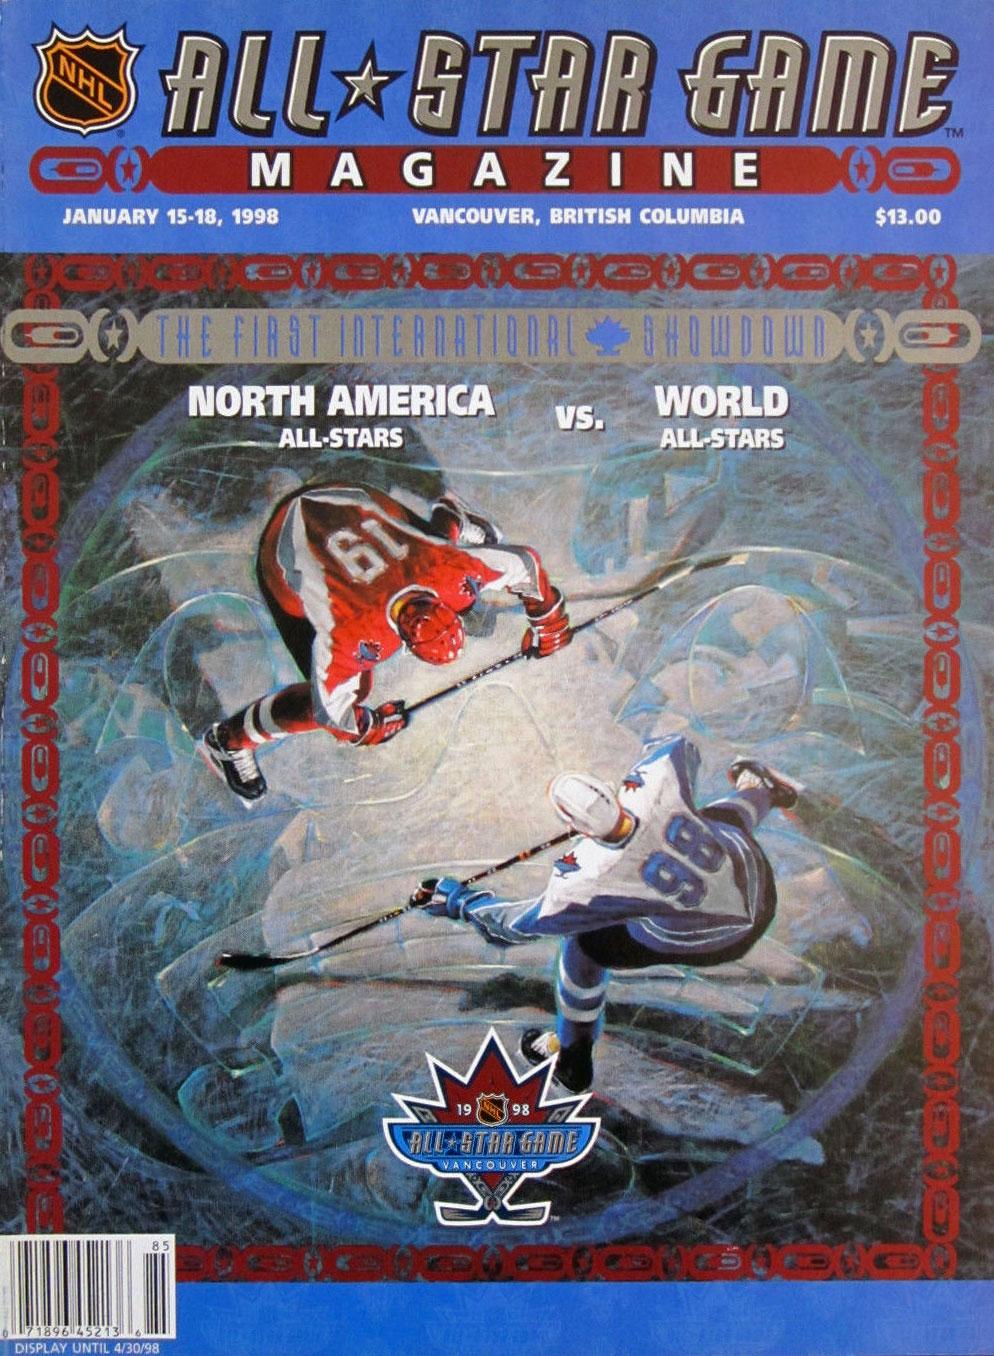 NHL All-Star Game Program Program (1997/98) - 1998 NHL All-Star Game program cover - game held in Vancouver, BC SportsLogos.Net